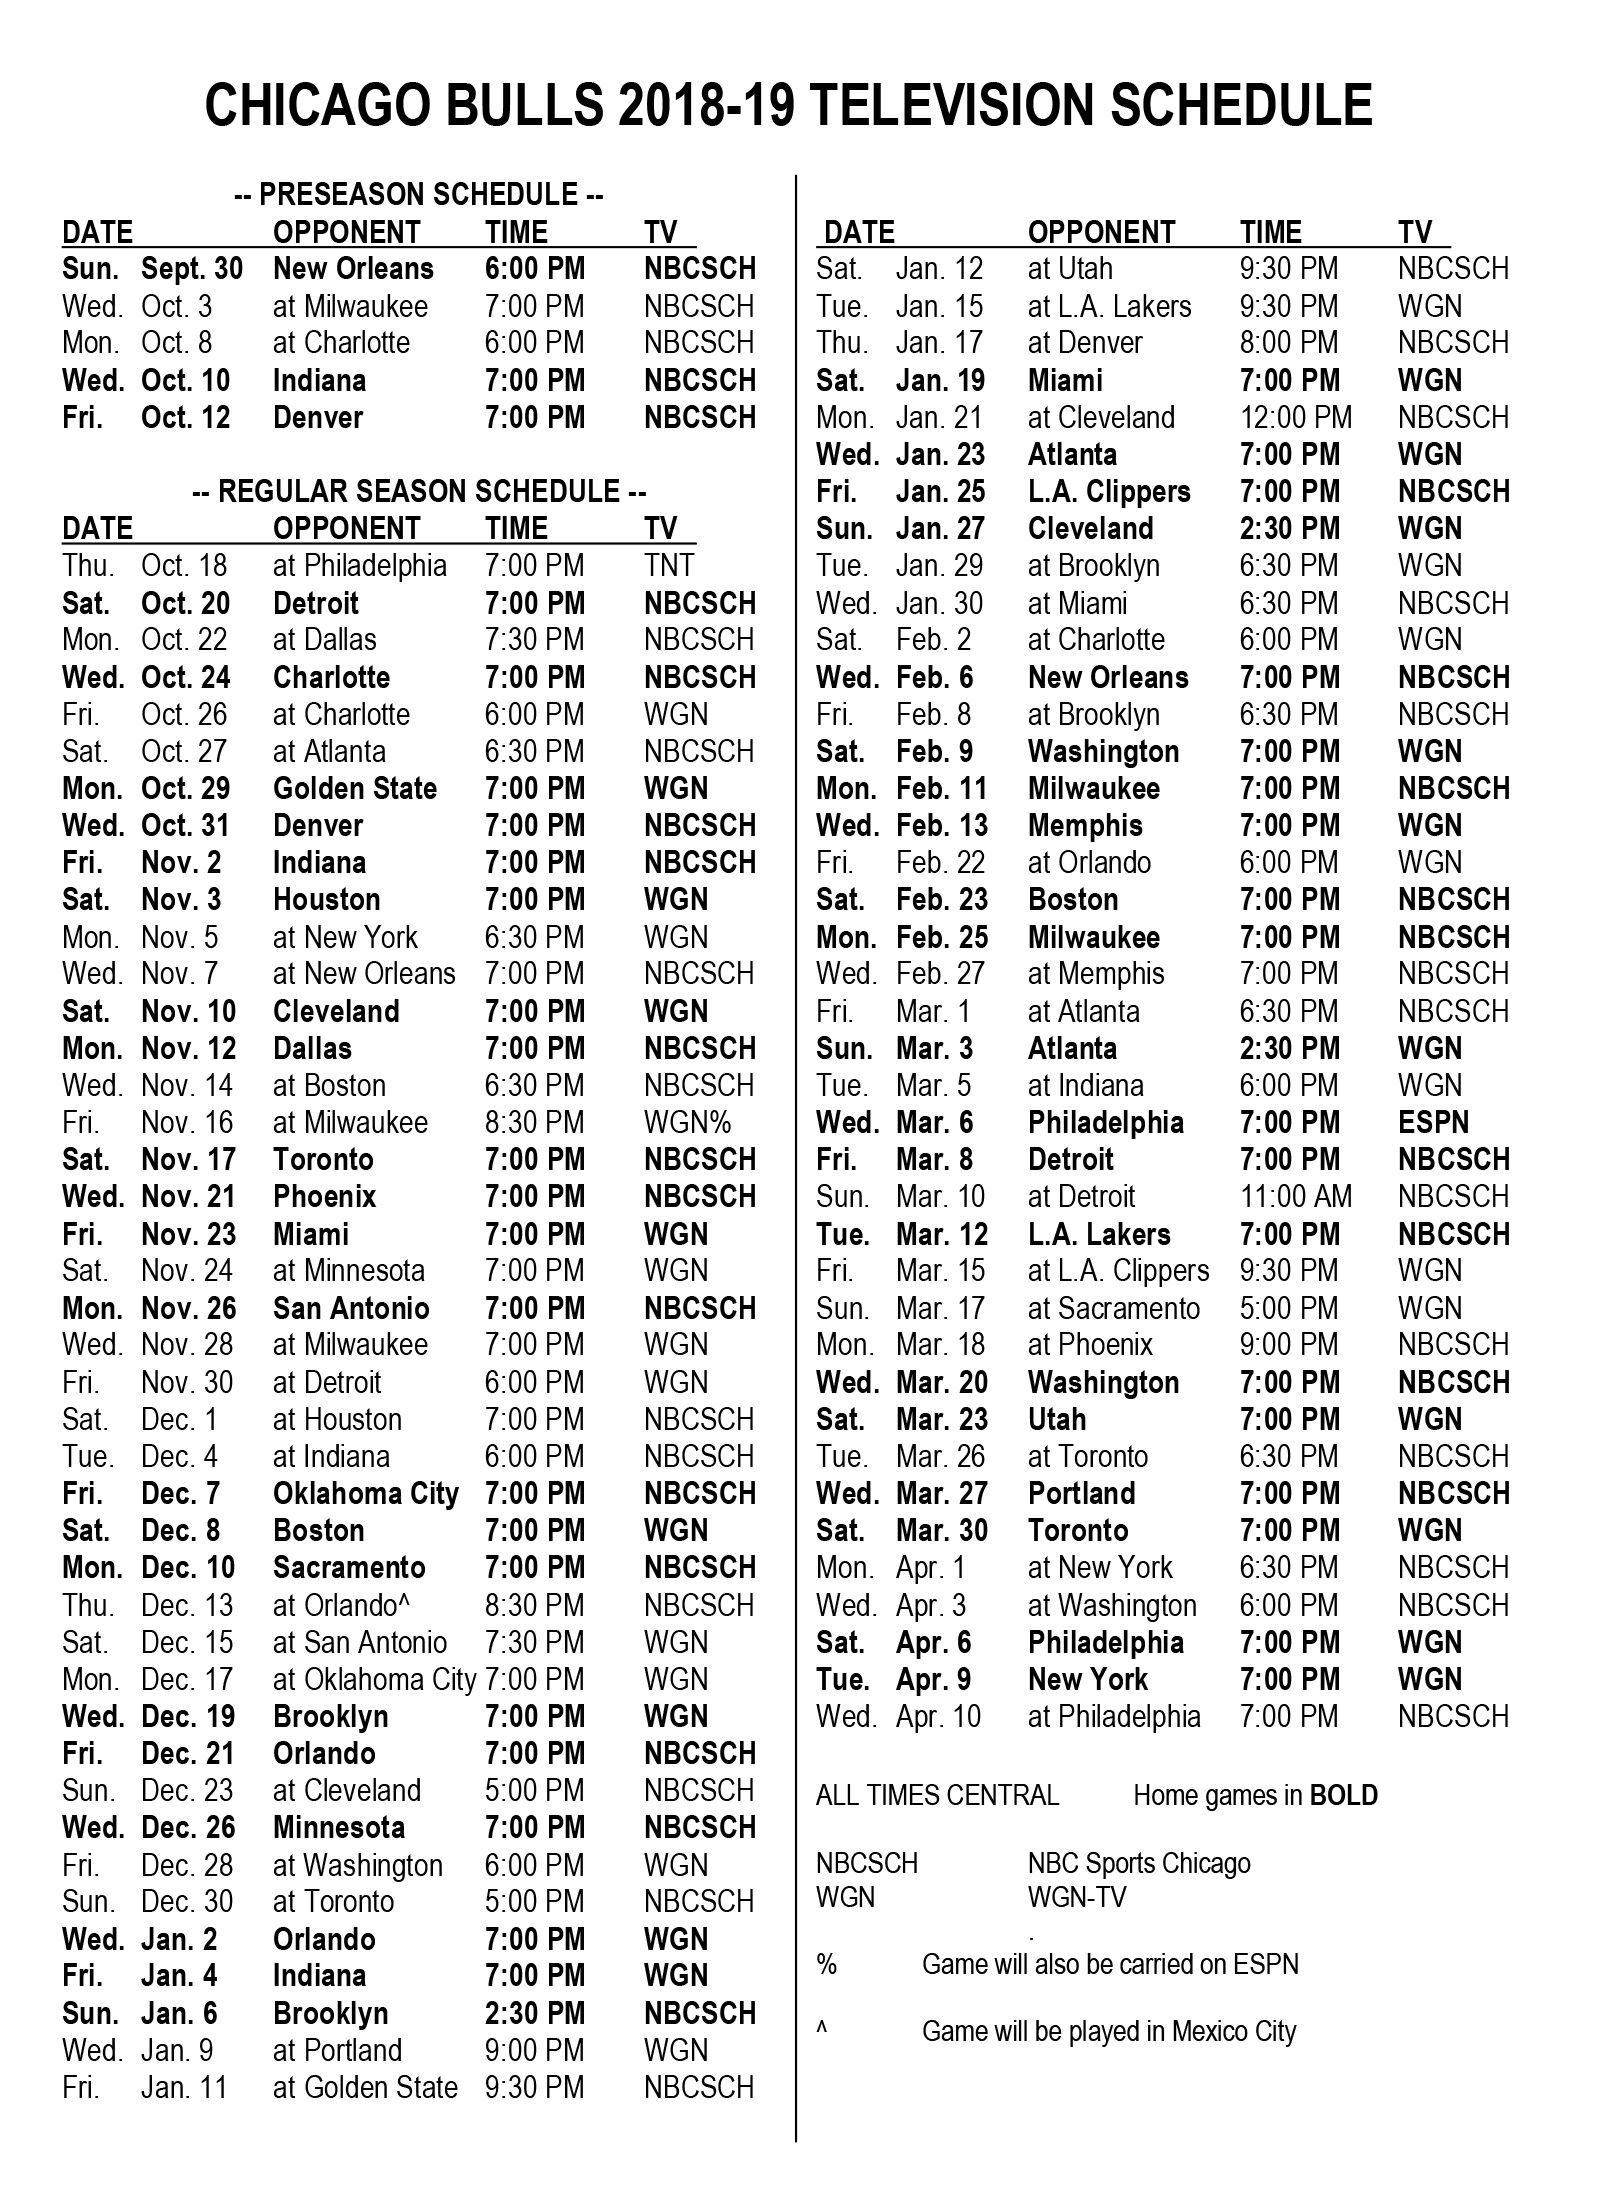 Bulls announce 201819 television schedule Chicago Bulls